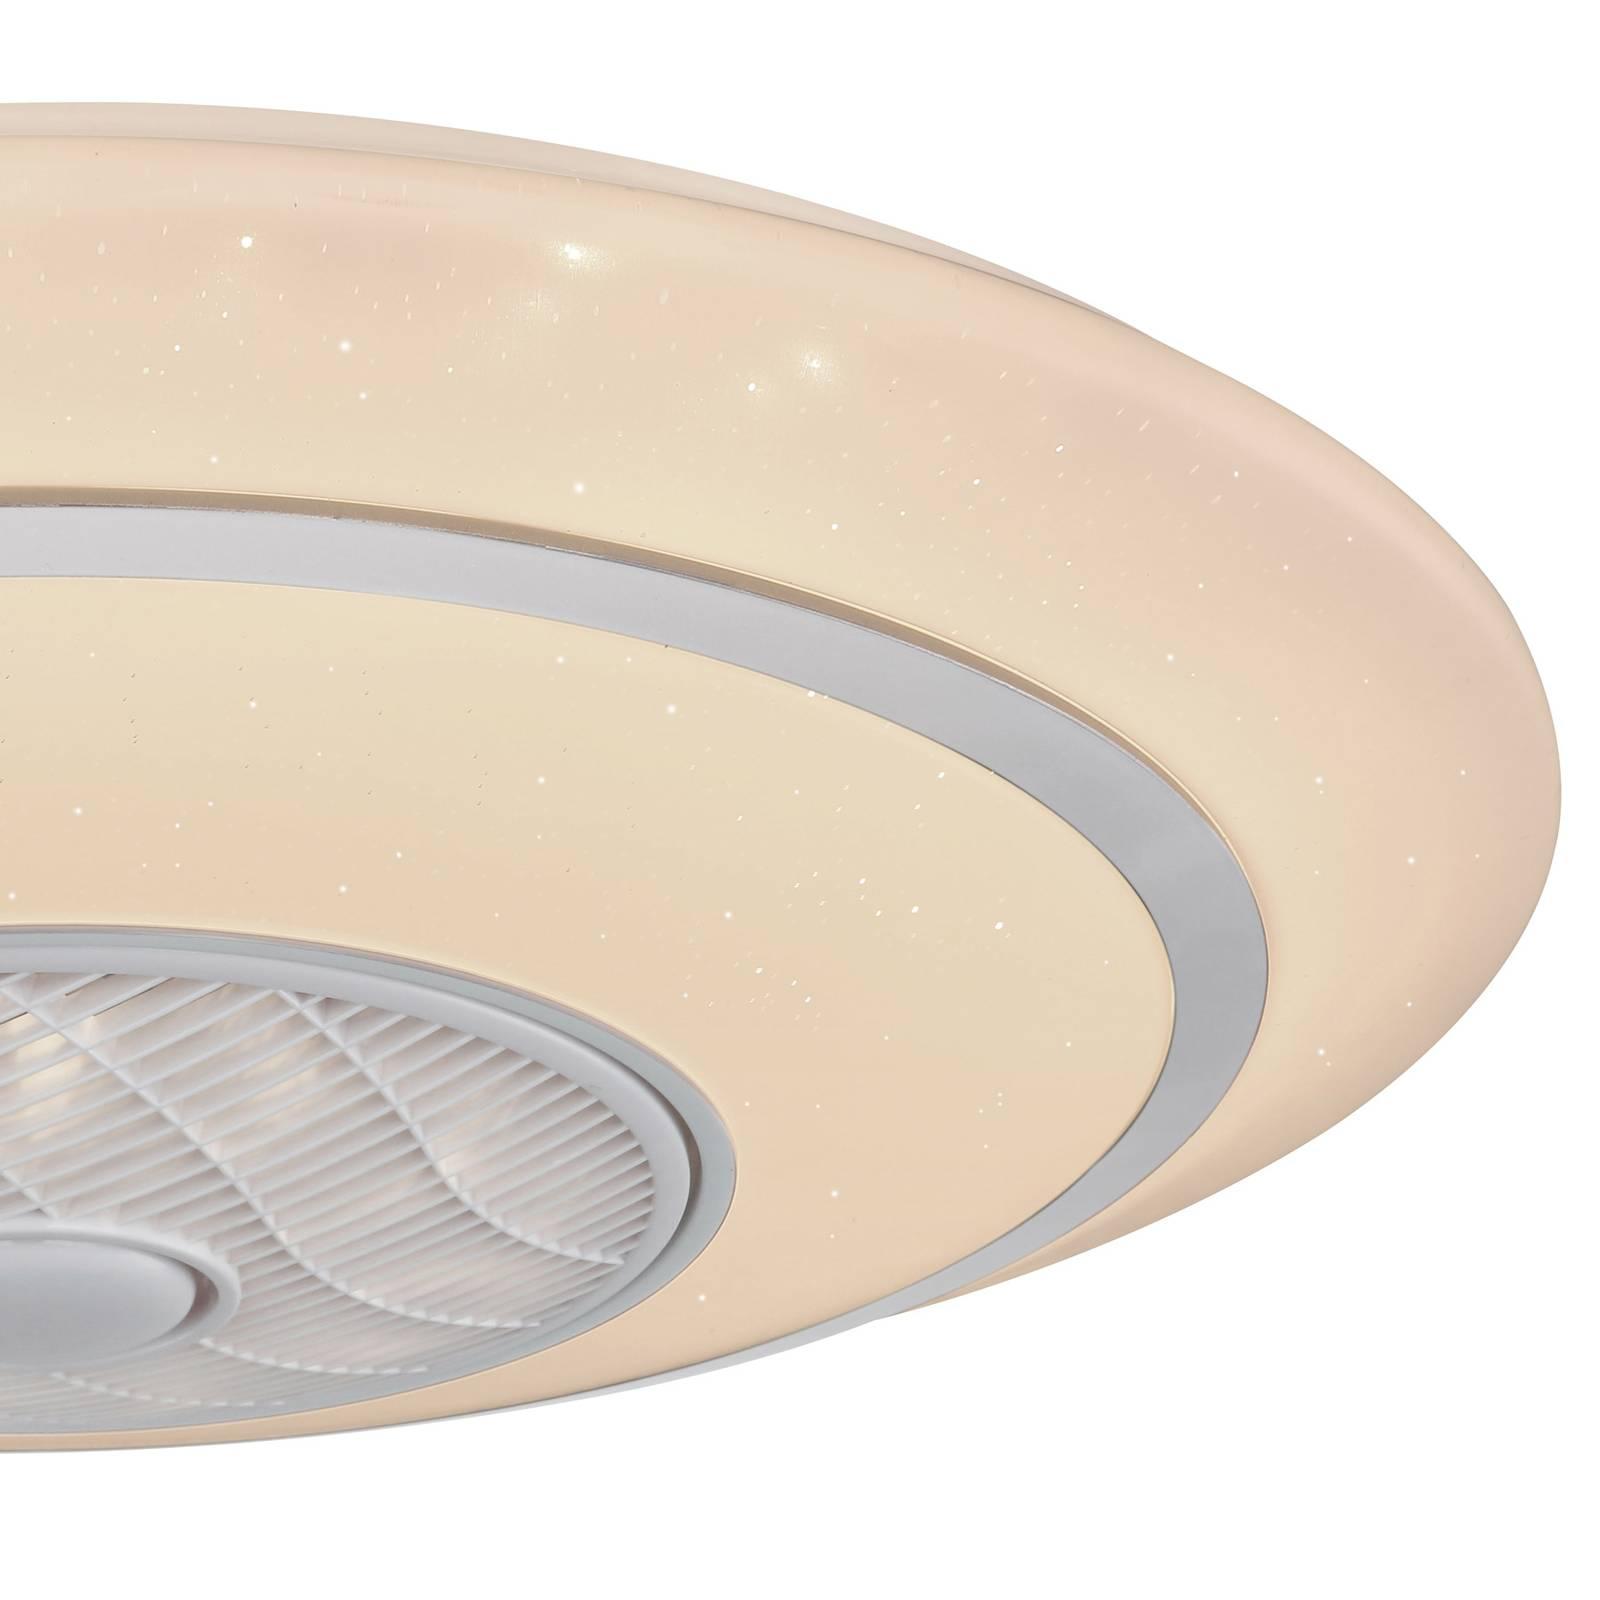 Kattotuuletin Rosario, LED, CCT, Ø 77 cm